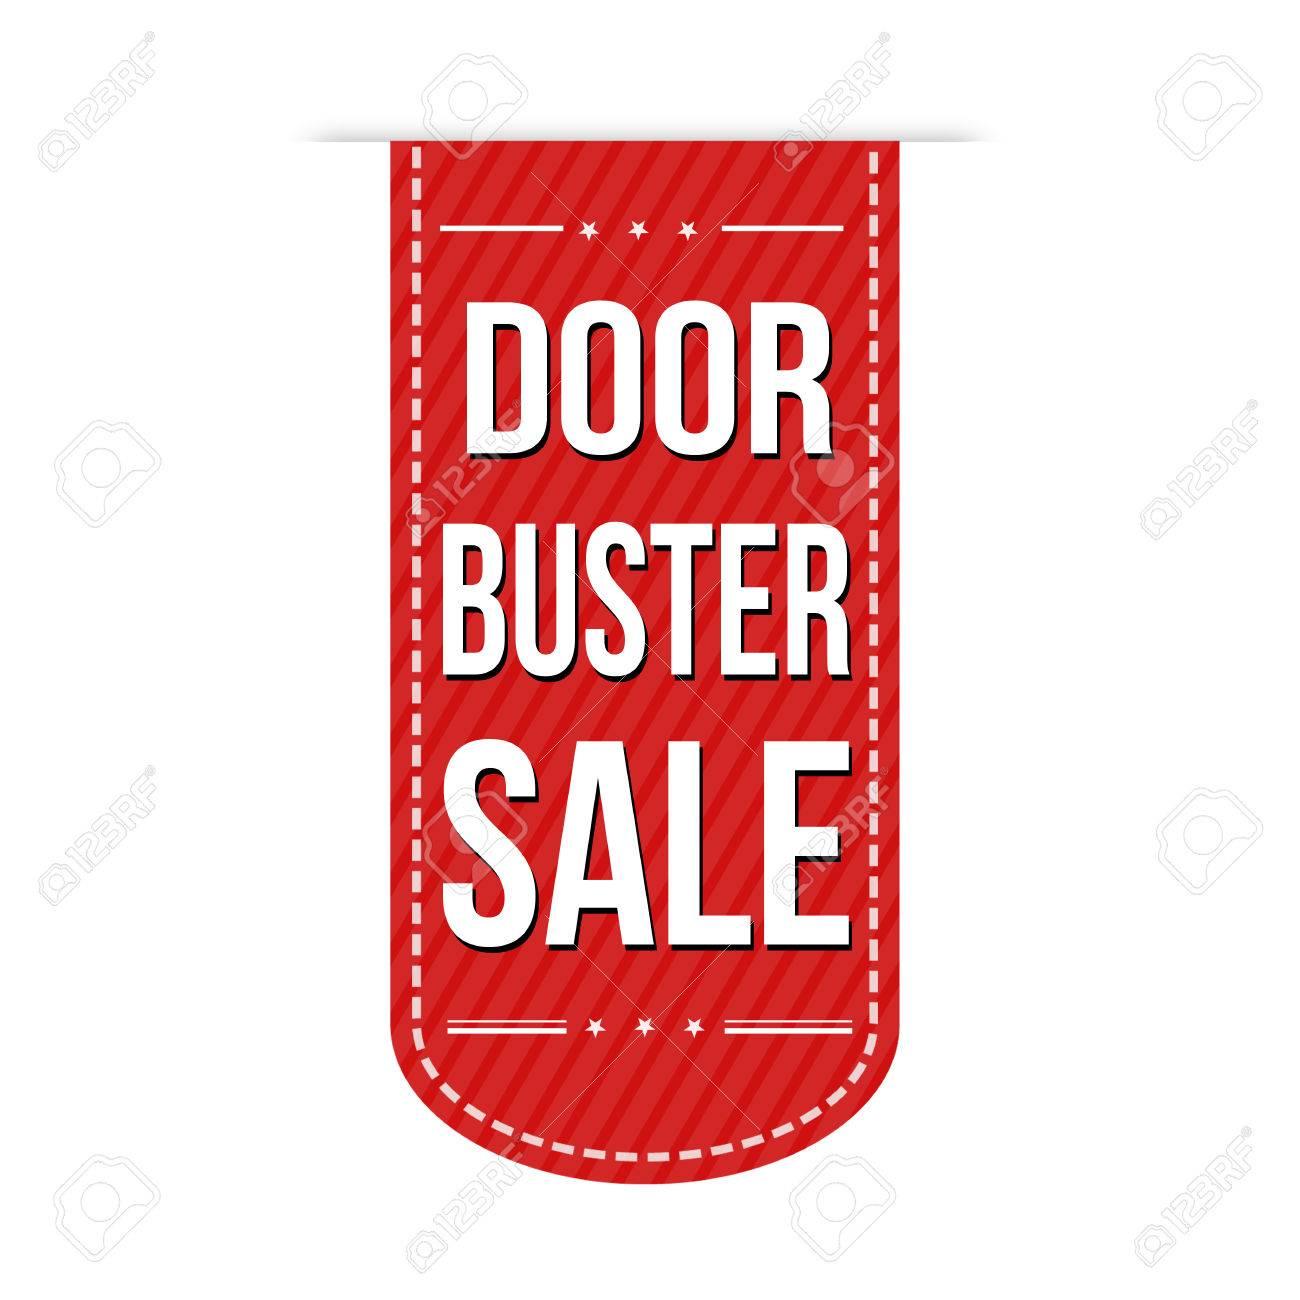 Door buster sale banner design over a white background Stock Vector - 49703503  sc 1 st  123RF.com & Door Buster Sale Banner Design Over A White Background Royalty Free ...